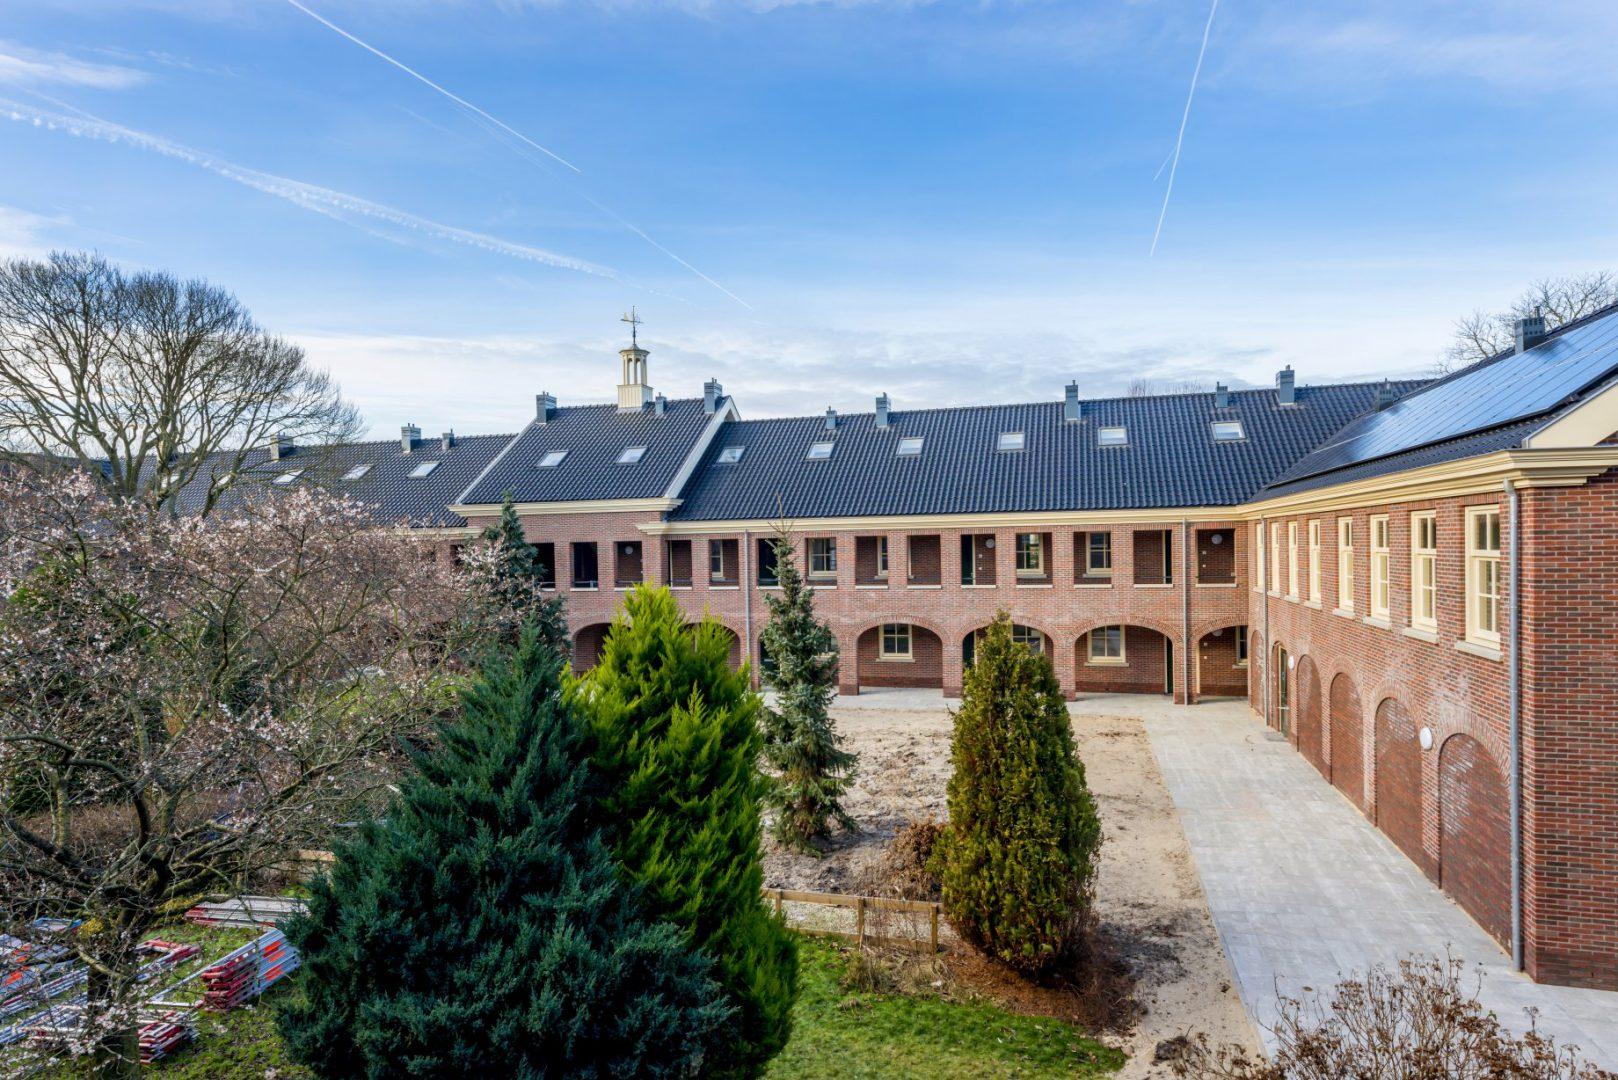 Ringershof-renovatie-ZIJLSTRA-SCHIPPER-architecten-architectenbureau-noord-holland-architect-015